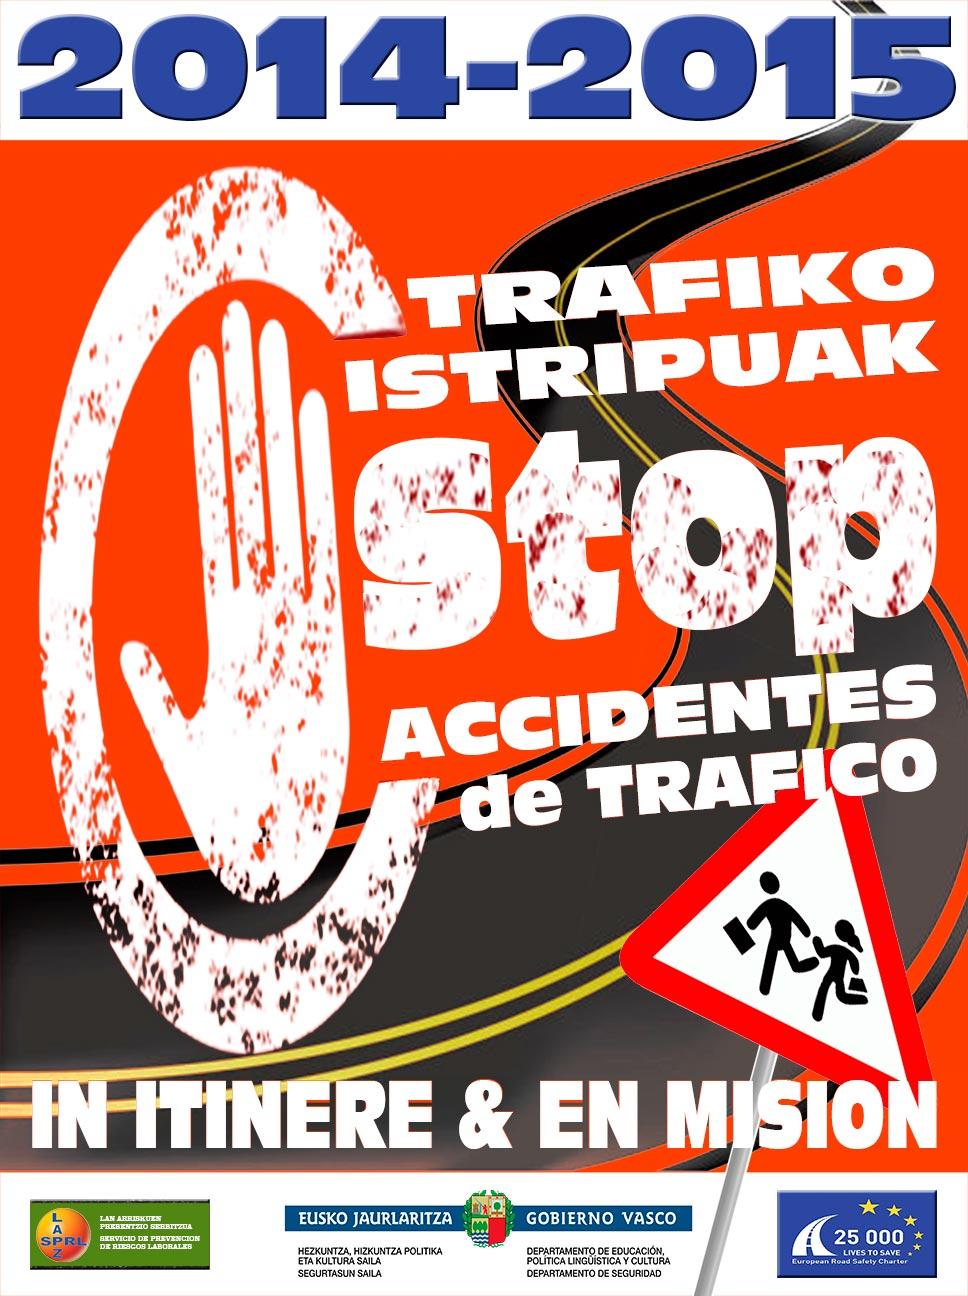 cartel_stop_accidentes_50_2014_2015.jpg